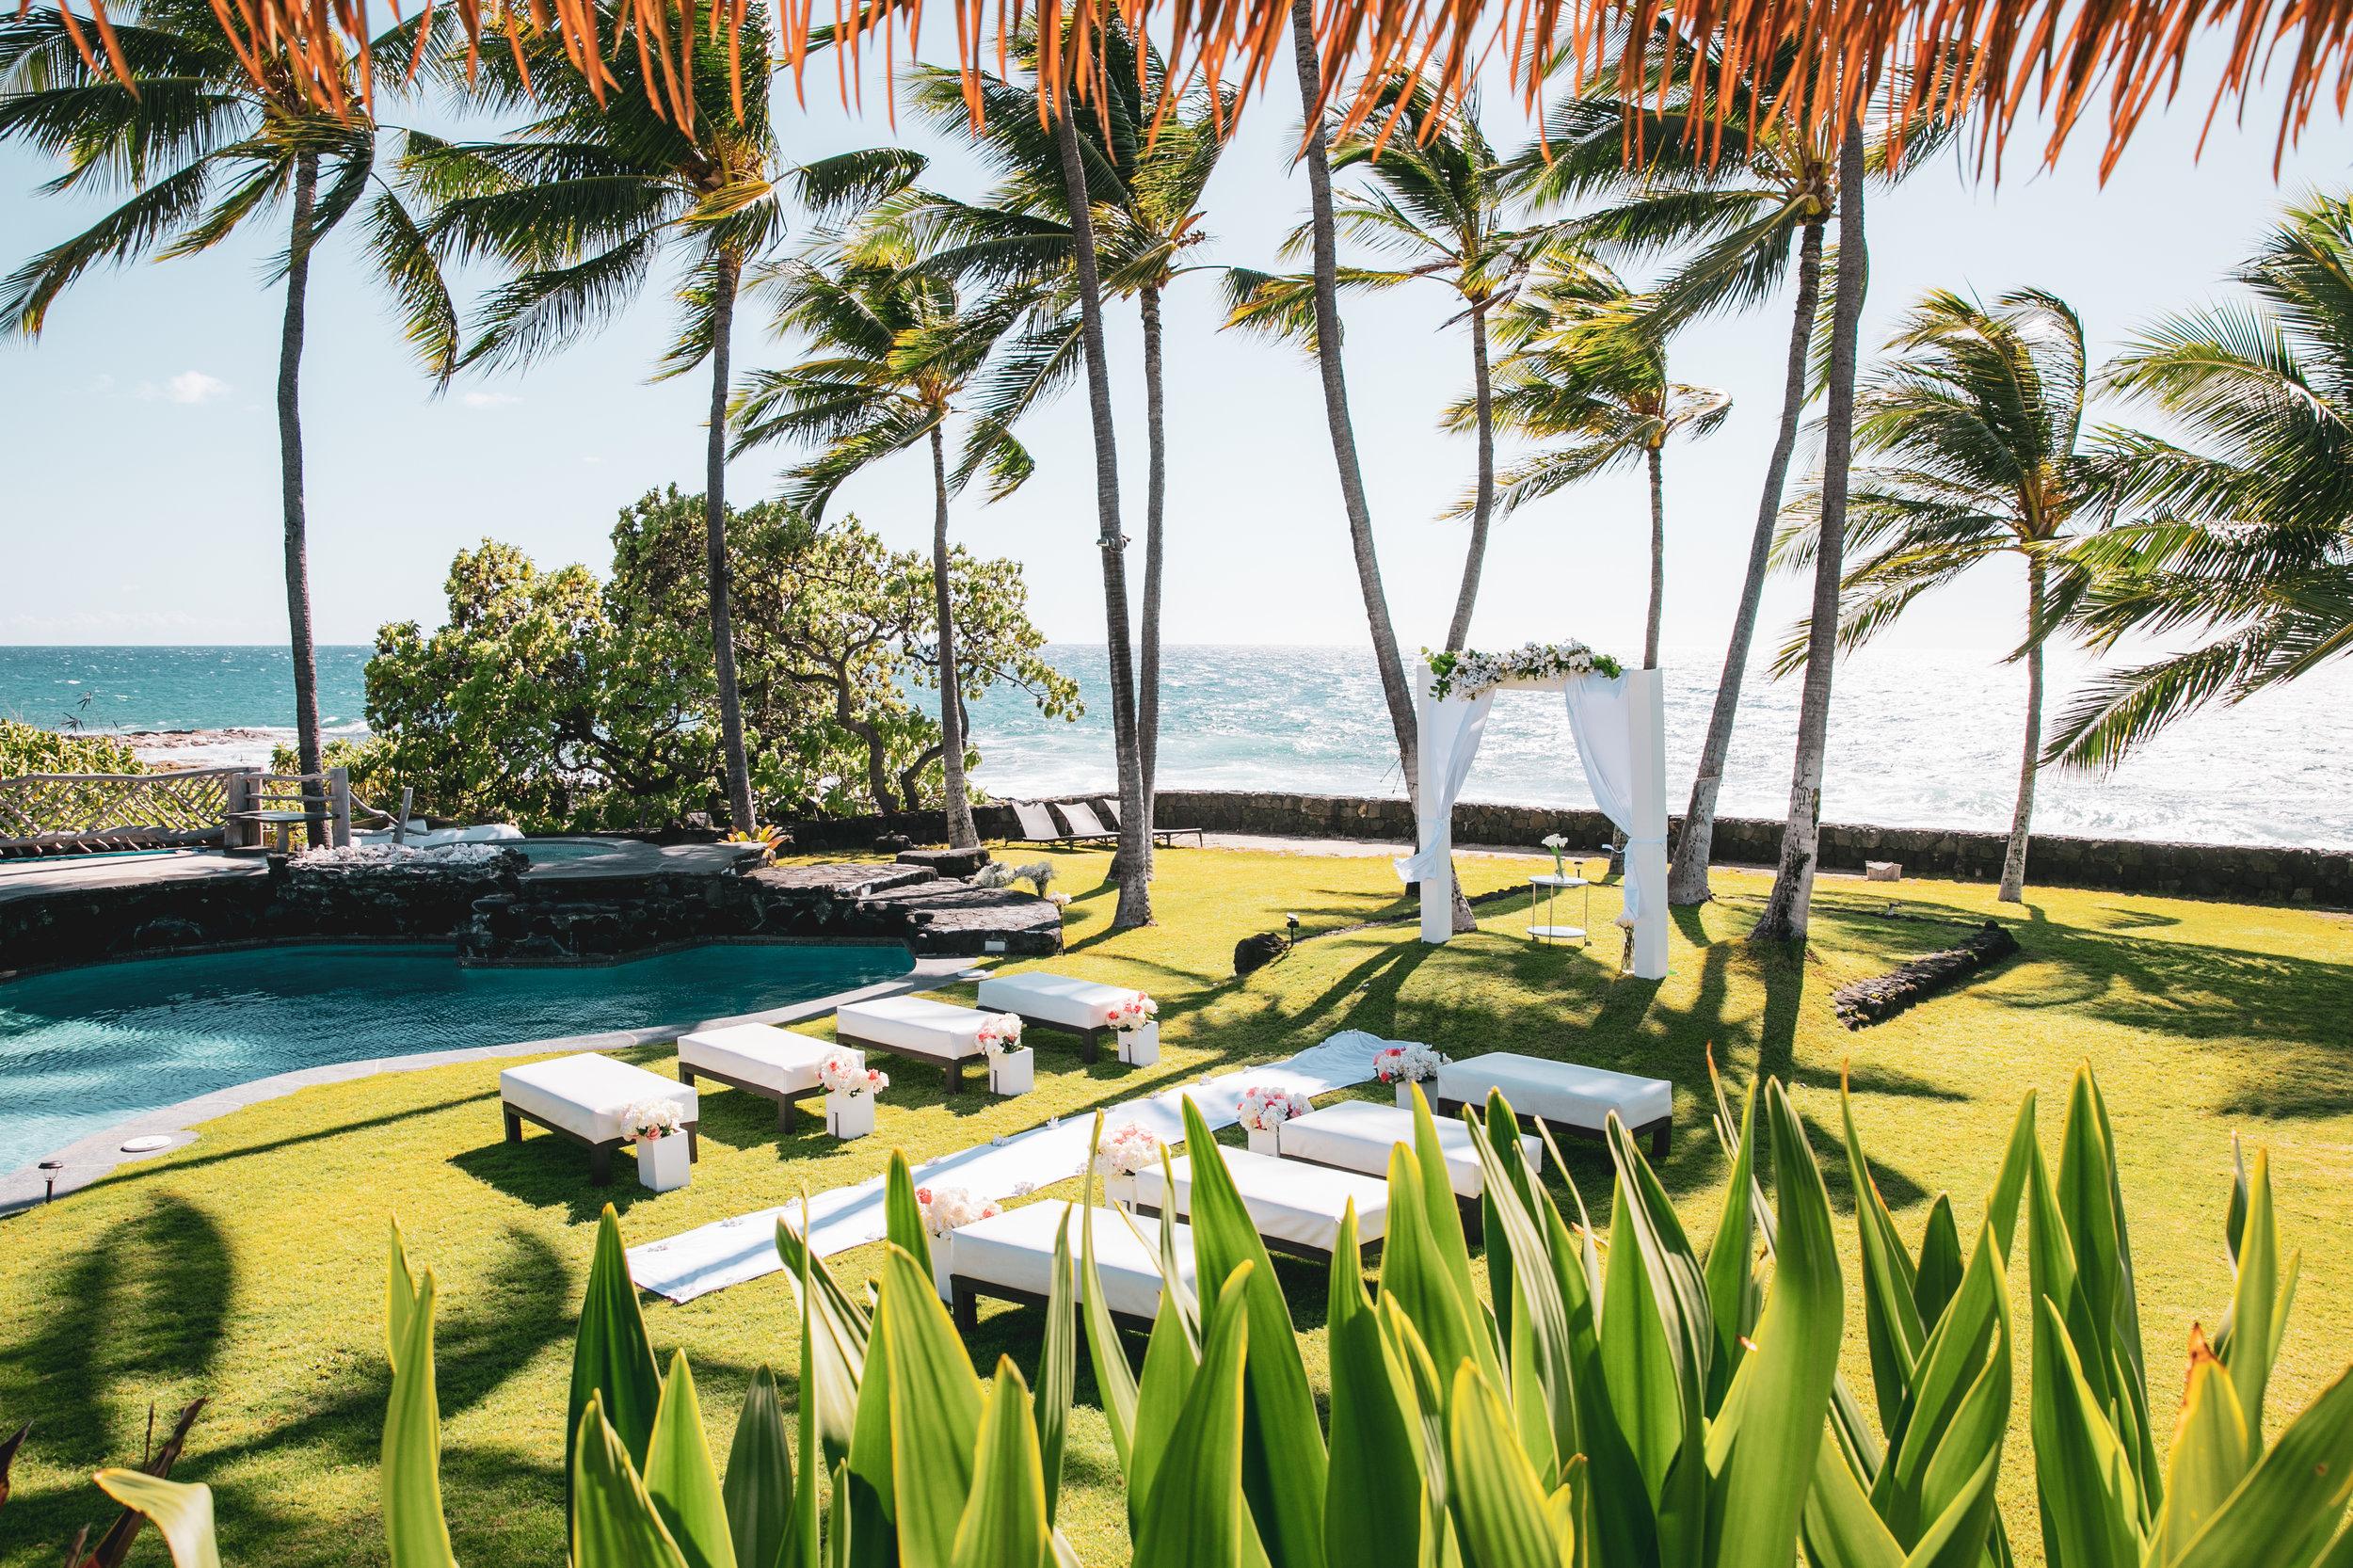 kelilina photography hawaii florida destination wedding photographer-31.jpg